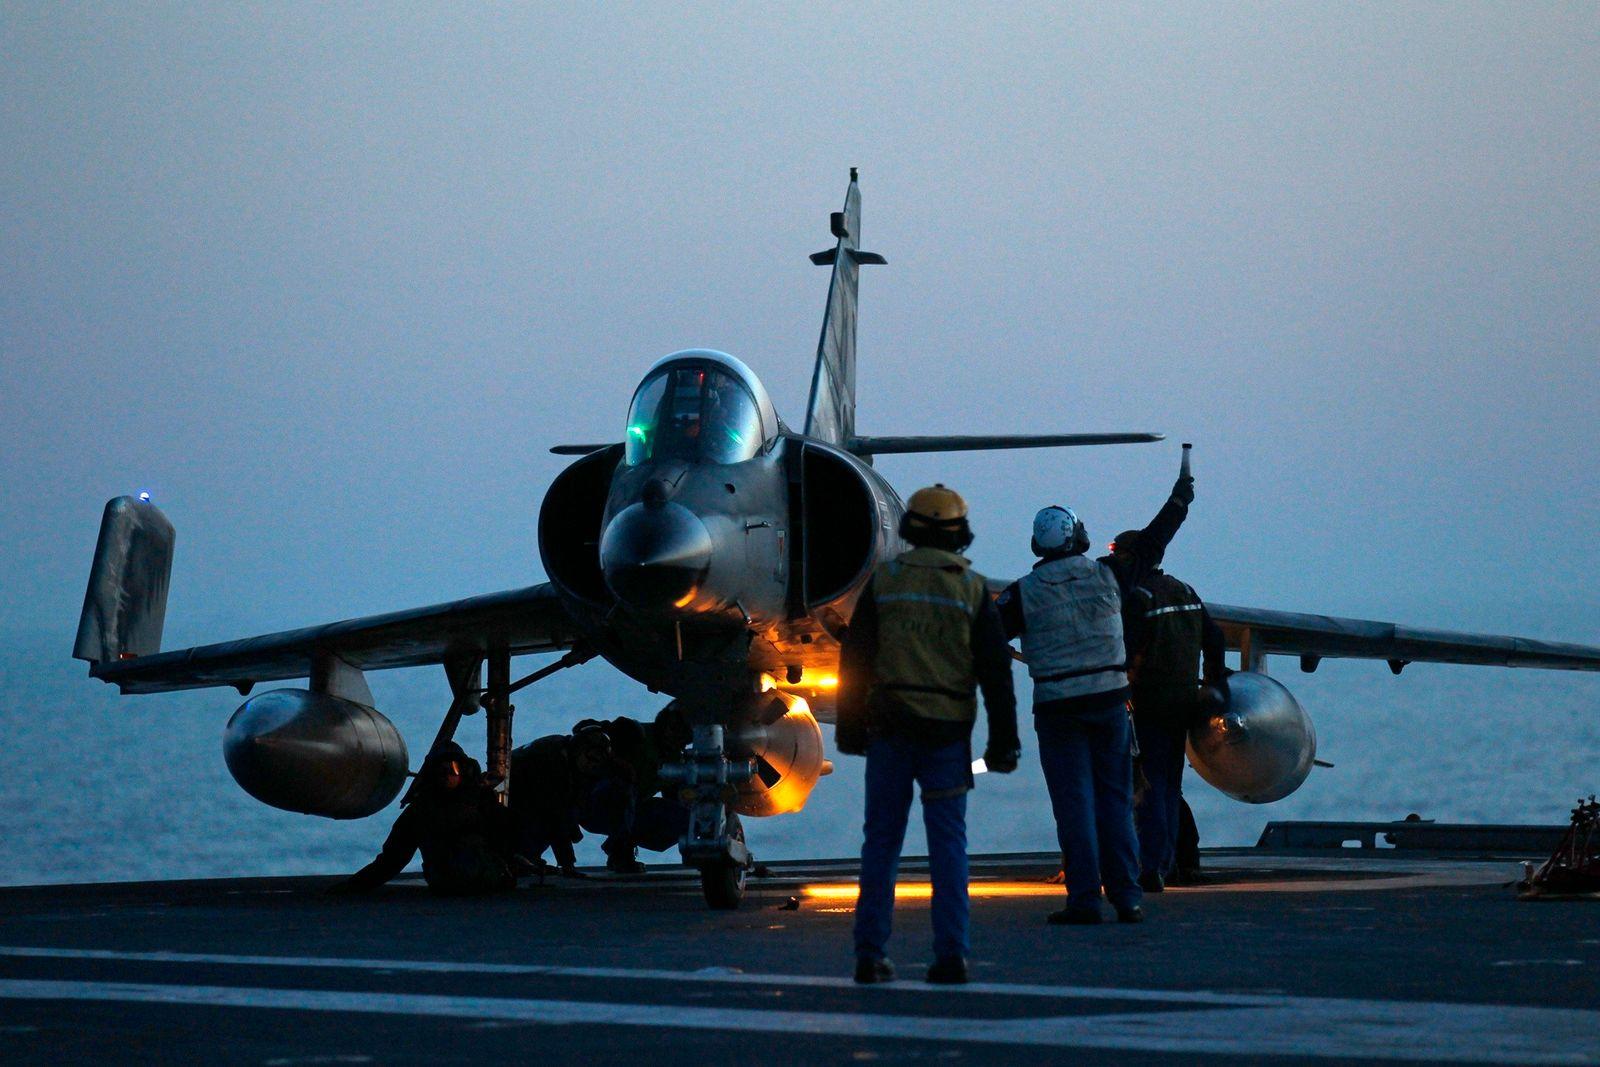 Flight deck crew work around a Super Etendard fighter jet aboard the Charles de Gaulle aircraft carrier